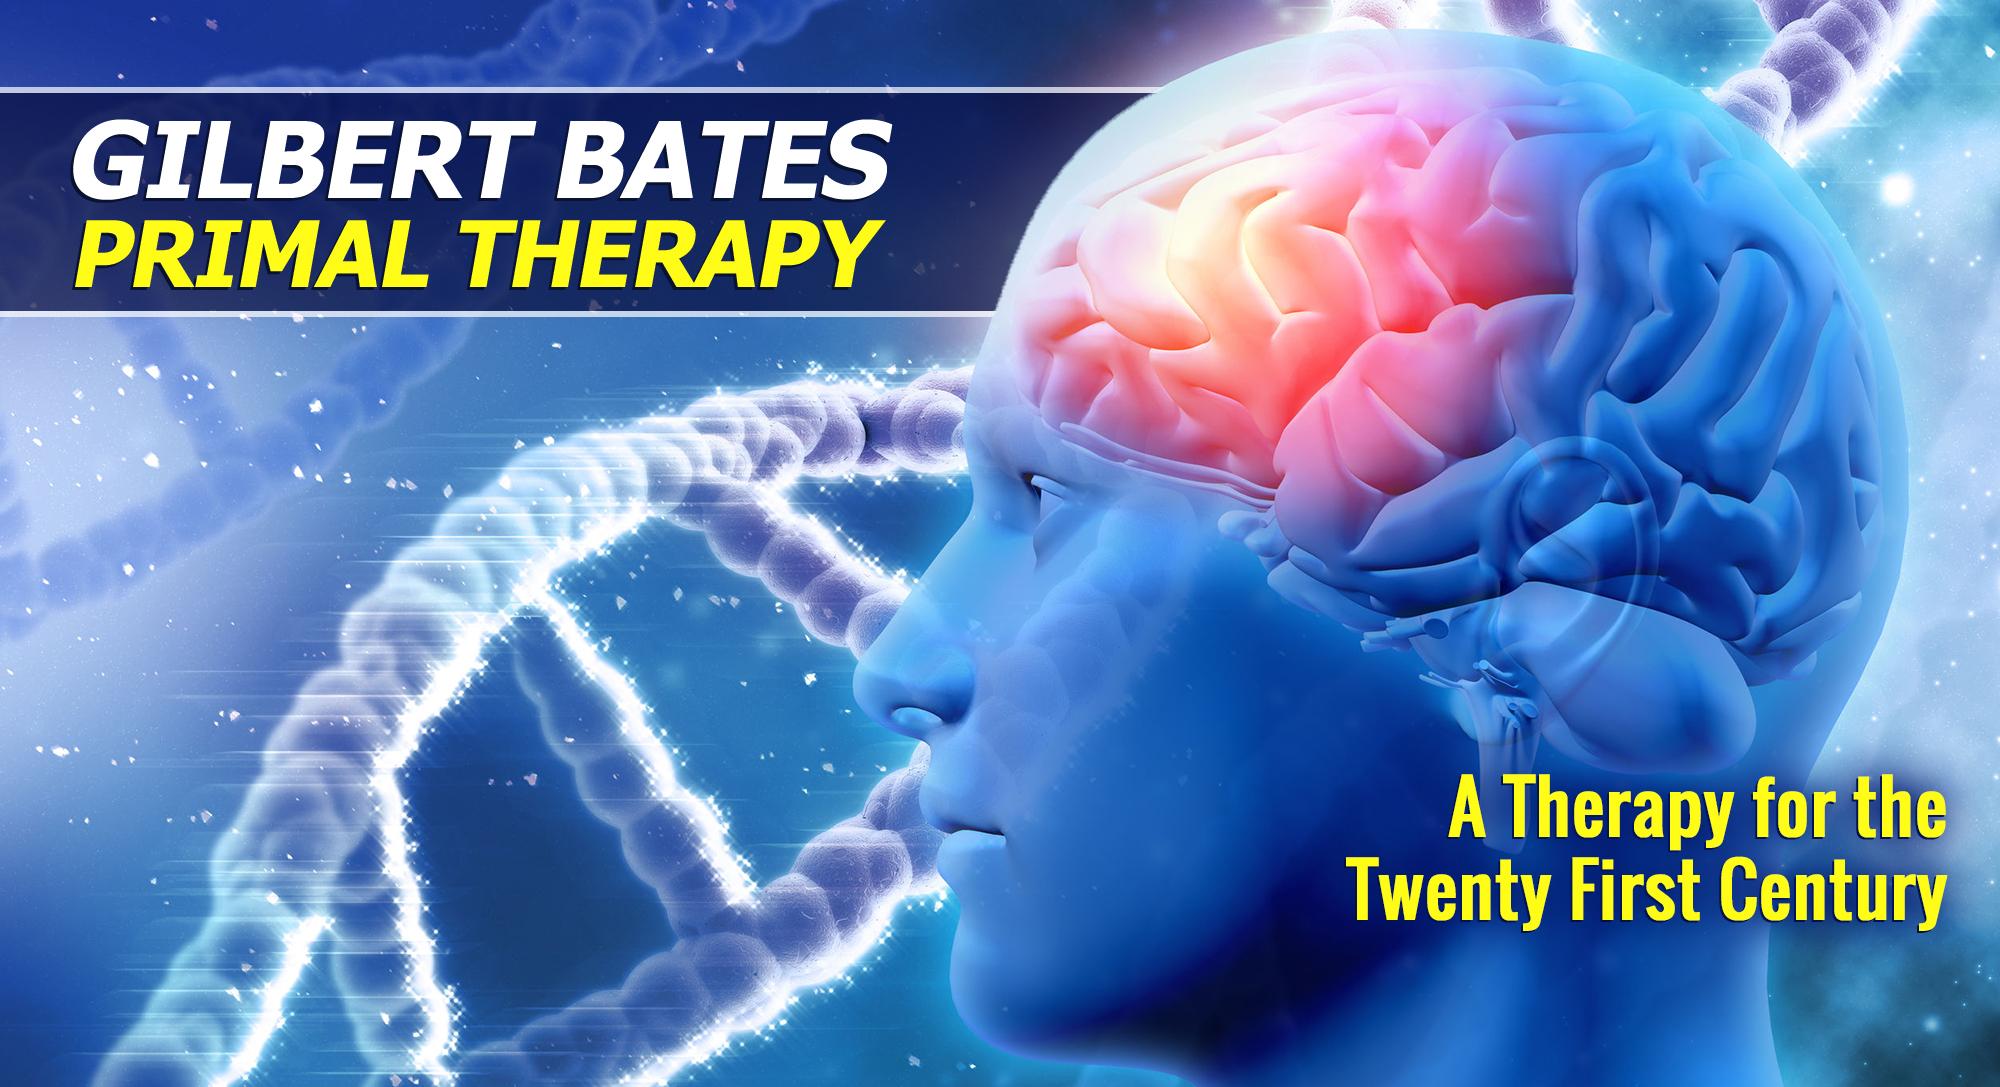 Gilbert Bates Primal Therapy